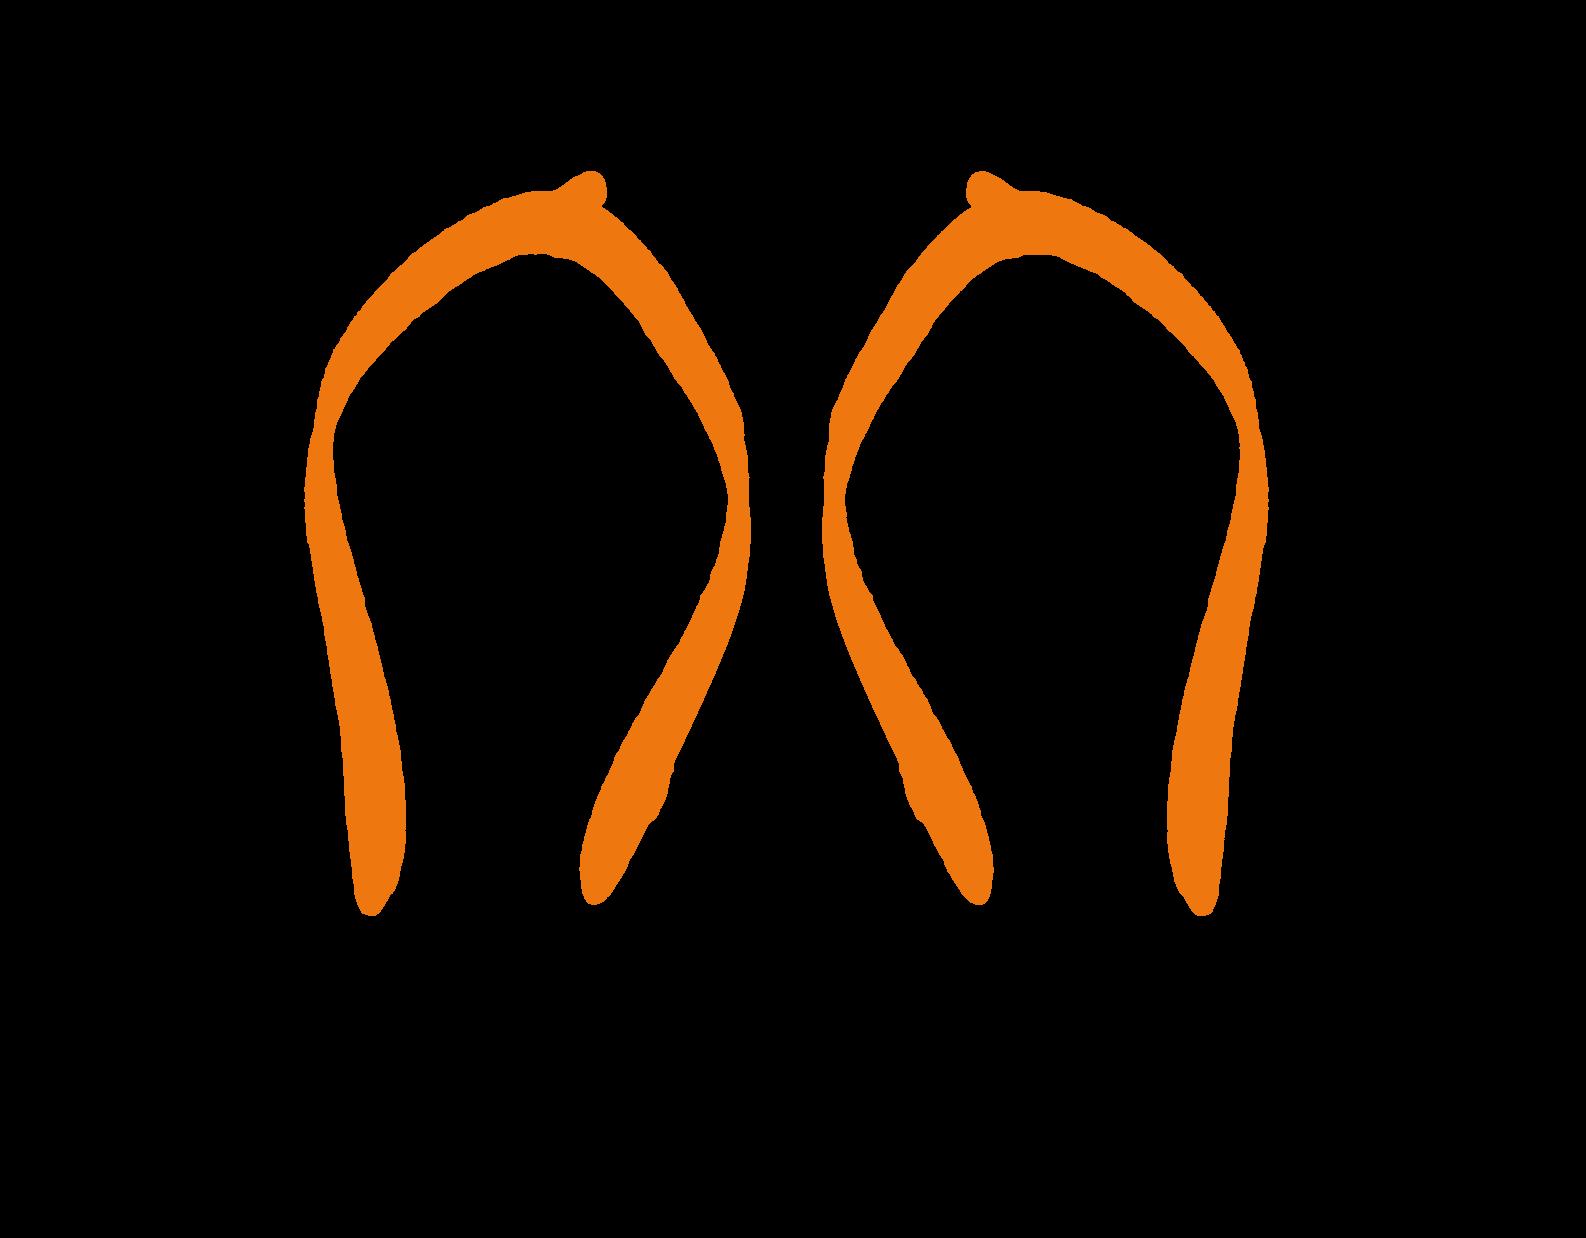 Orange straps